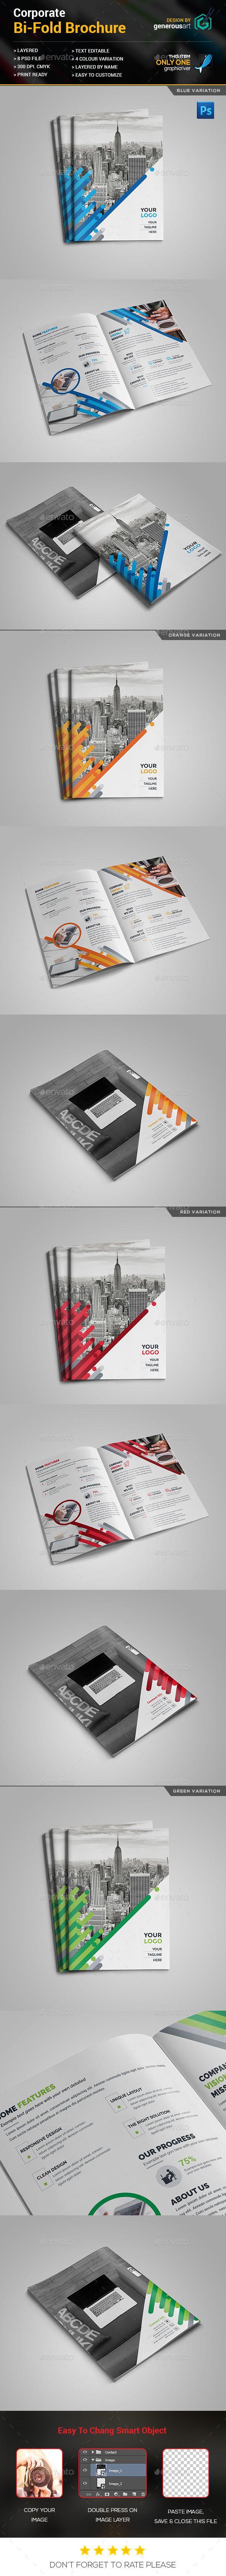 Business Bi-Fold Brochure Template PSD. Download here: http://graphicriver.net/item/business-bifold-brochure/16689167?ref=ksioks